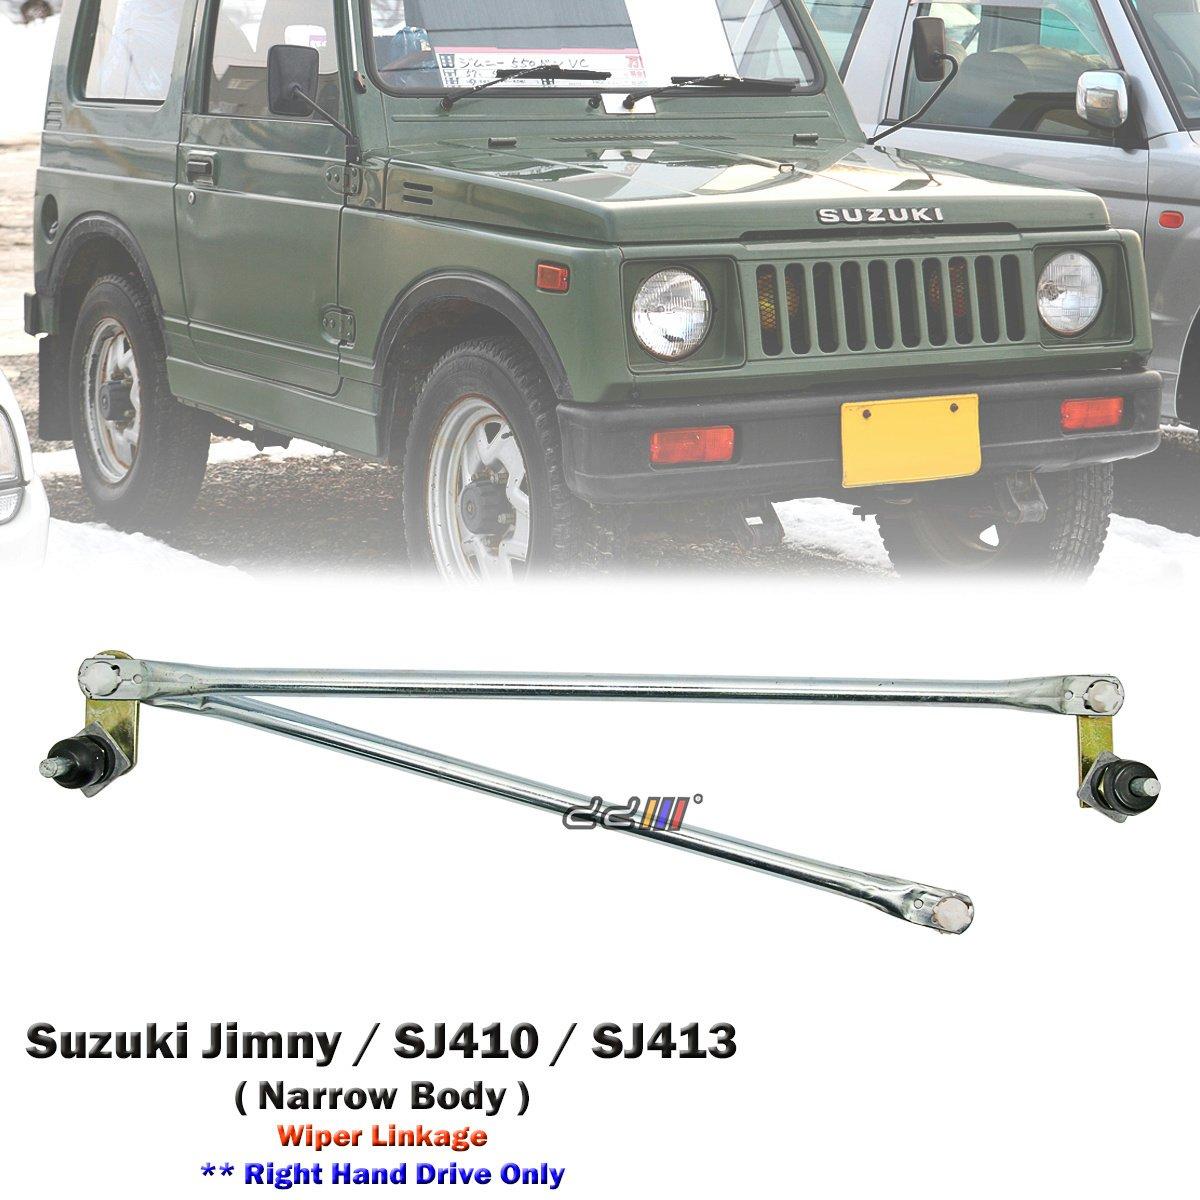 Amazon.com: Windshield Wiper Link For Suzuki Jimny Sierra SJ410 SJ413 Holden Drover Narrow: Automotive